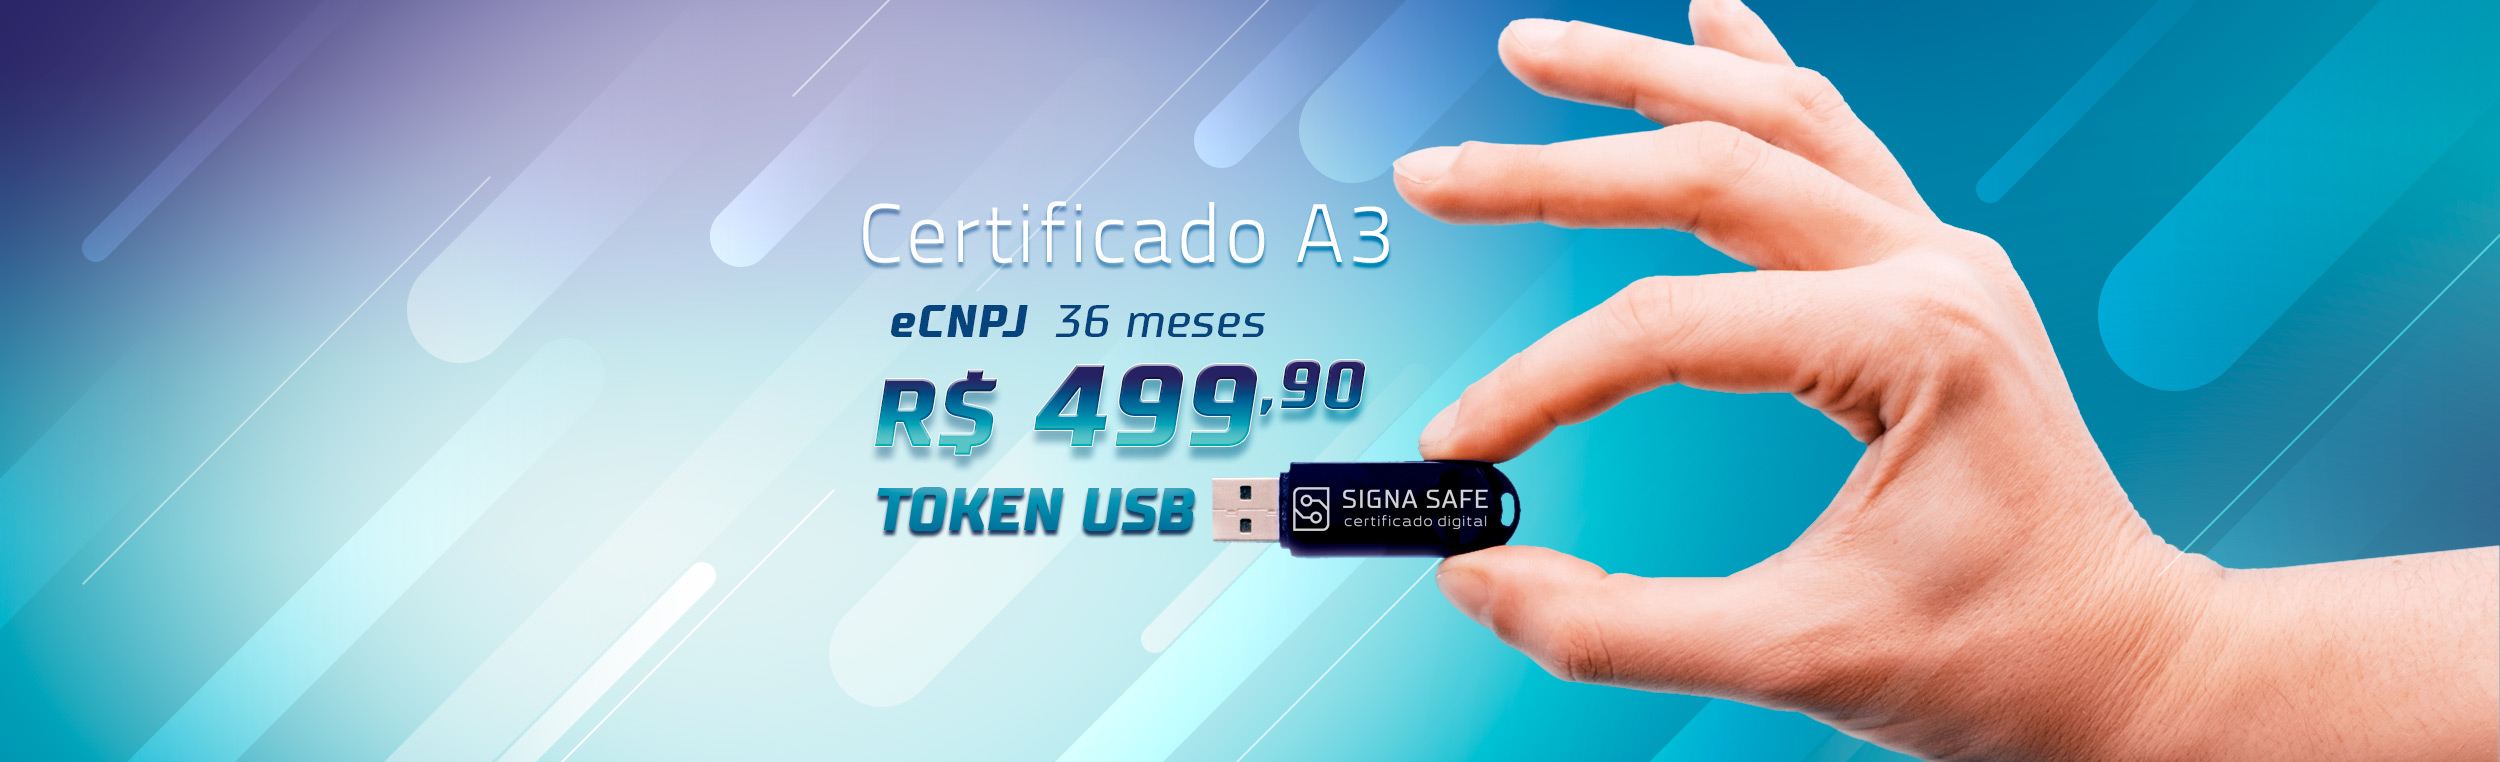 Token Certificado A3 Preço 499